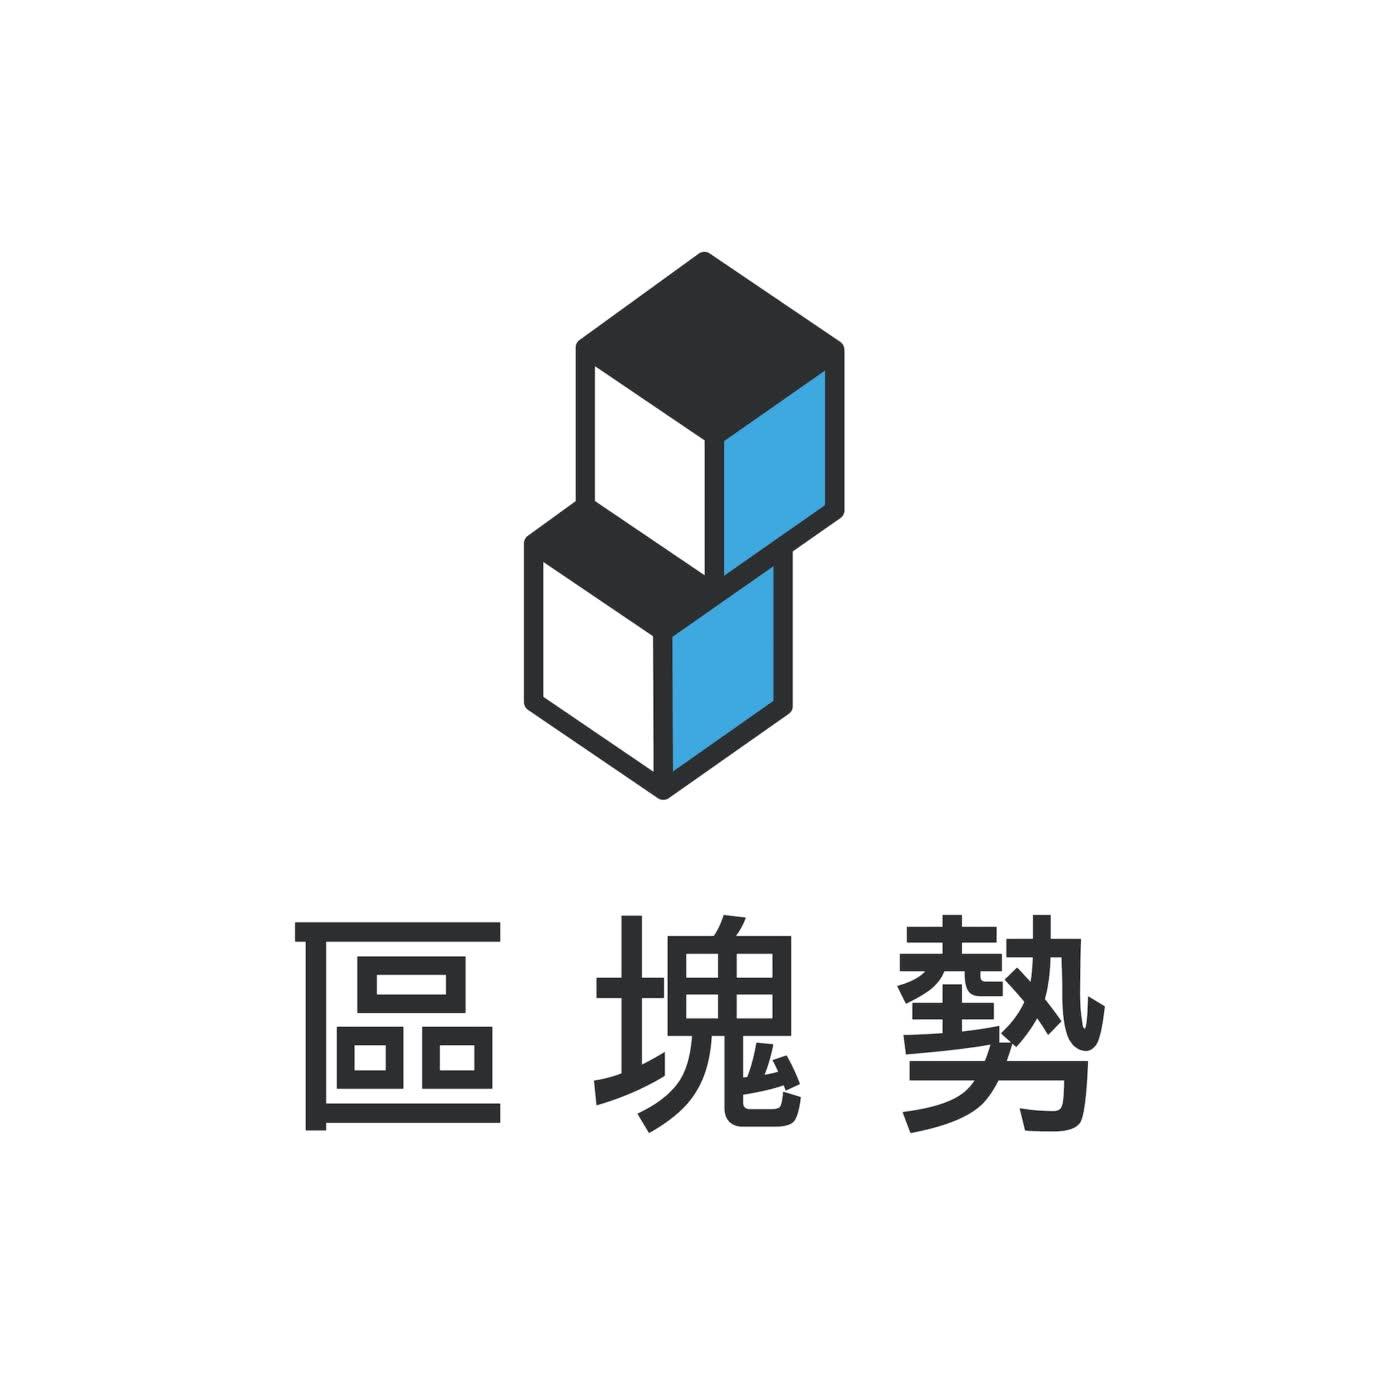 EP.97 將去中心化服務搬到臉書 ft. Mask Network 創辦人閻晗(Suji)